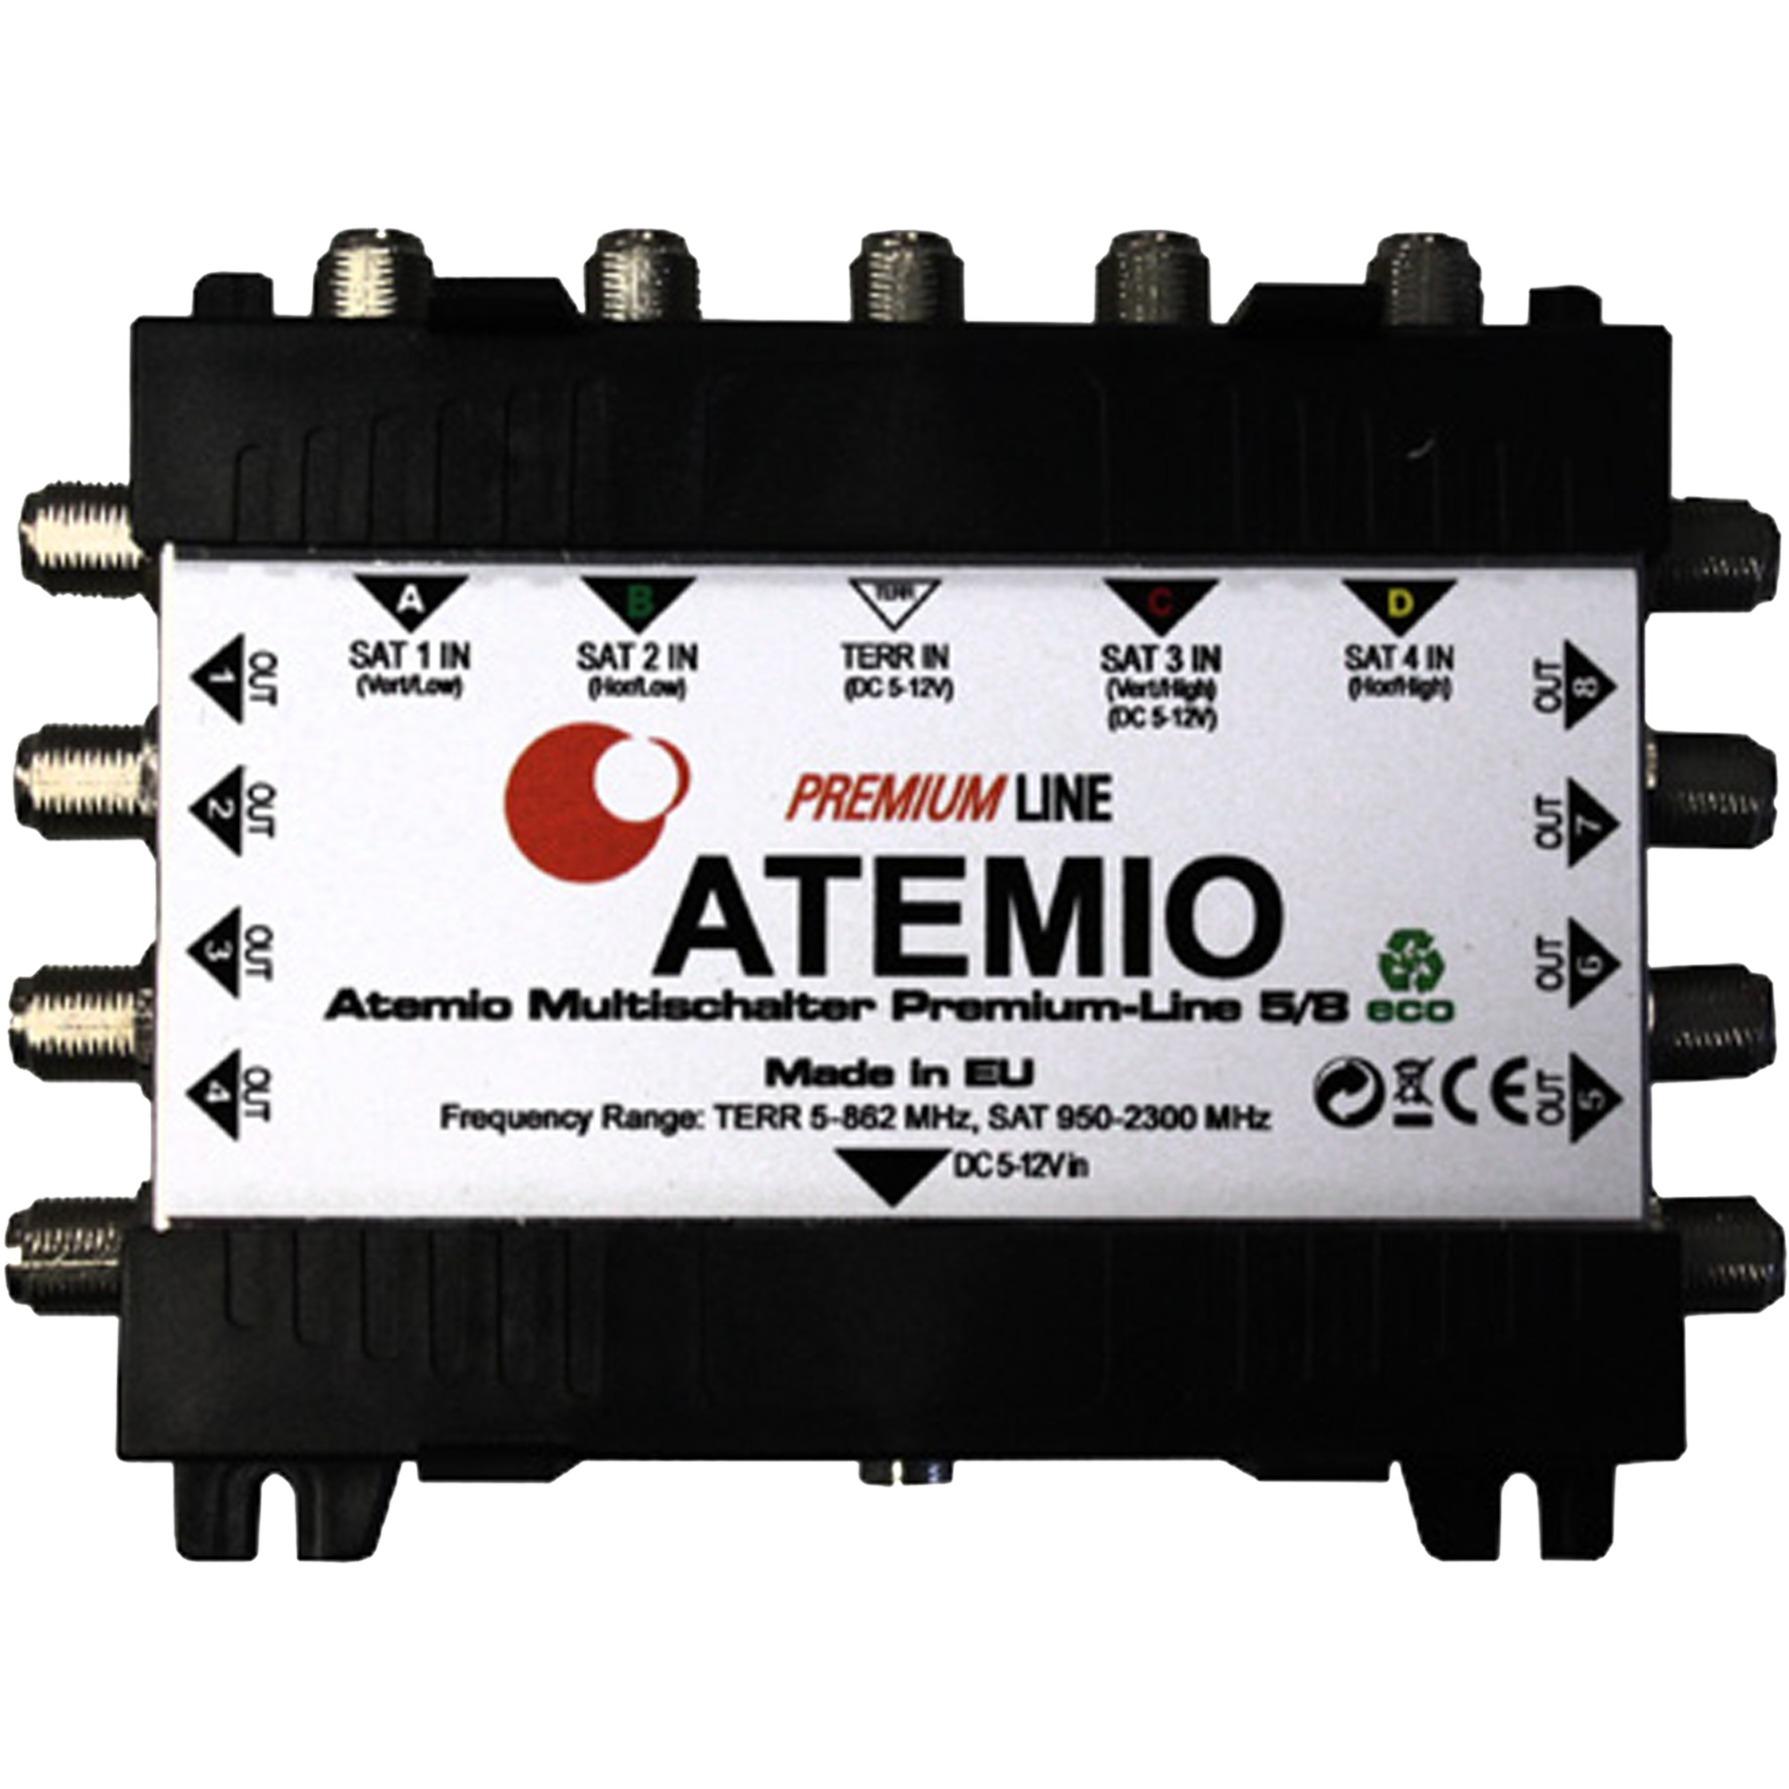 Premium-Line 5/8 eco, Interruptor múltiple